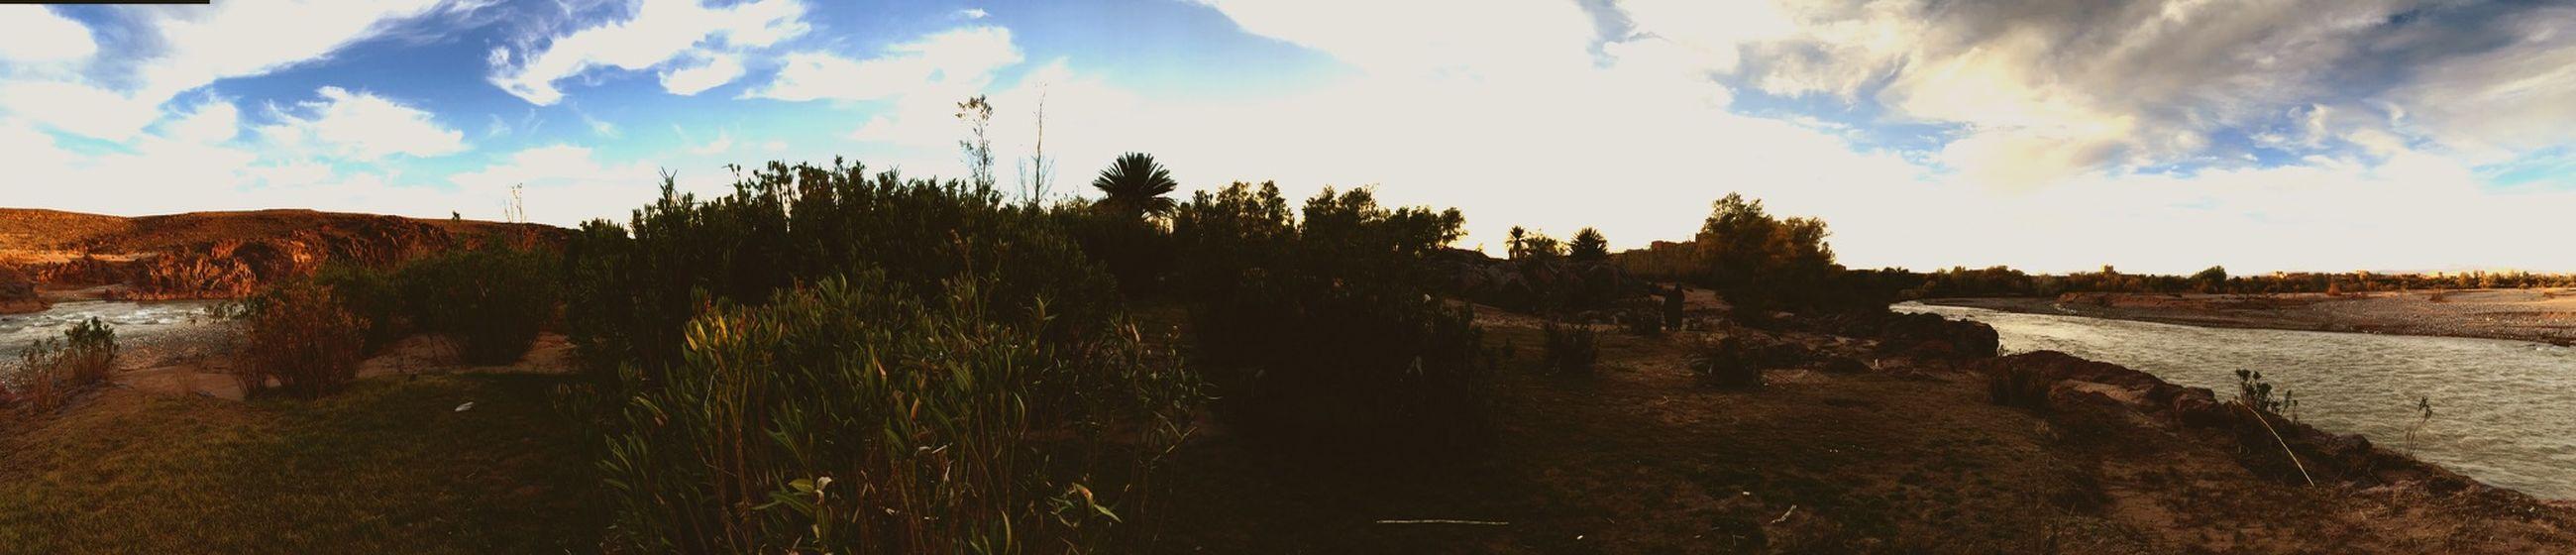 Imassine Panoramic Photography M.EL AAMRANI Imassine Marocco Maroc